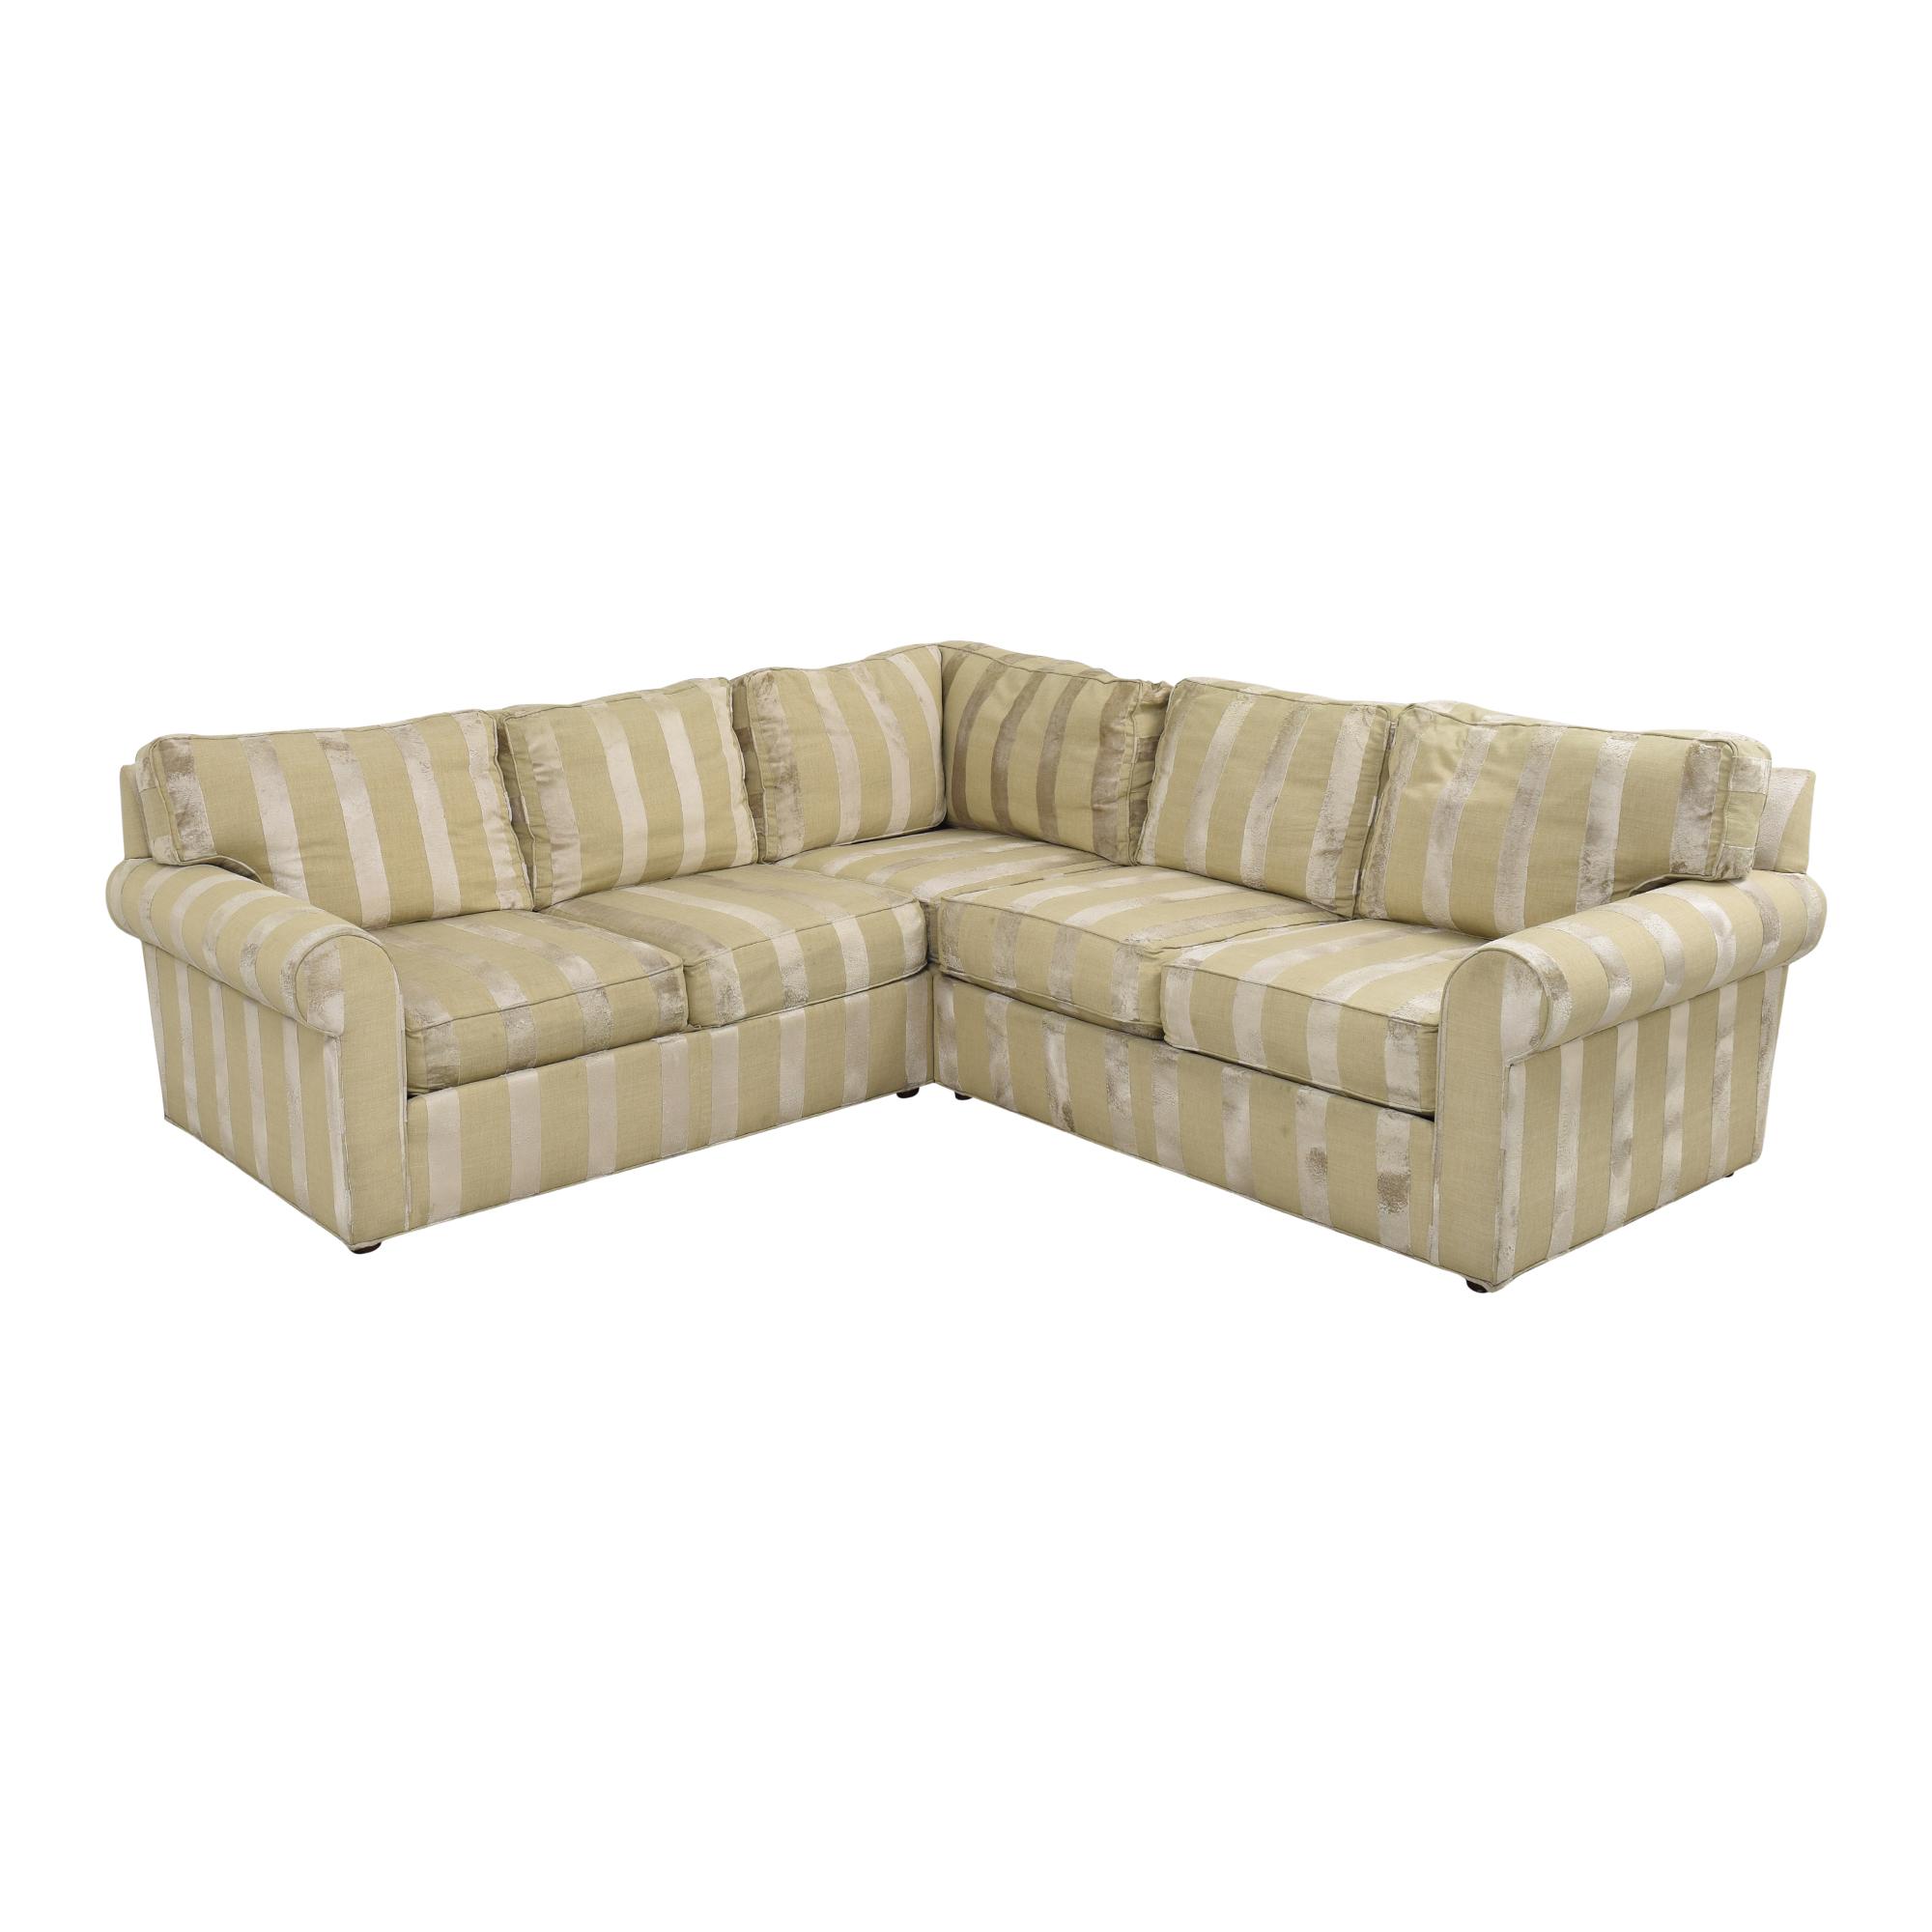 Ethan Allen Ethan Allen Bennet Sectional Sofa price